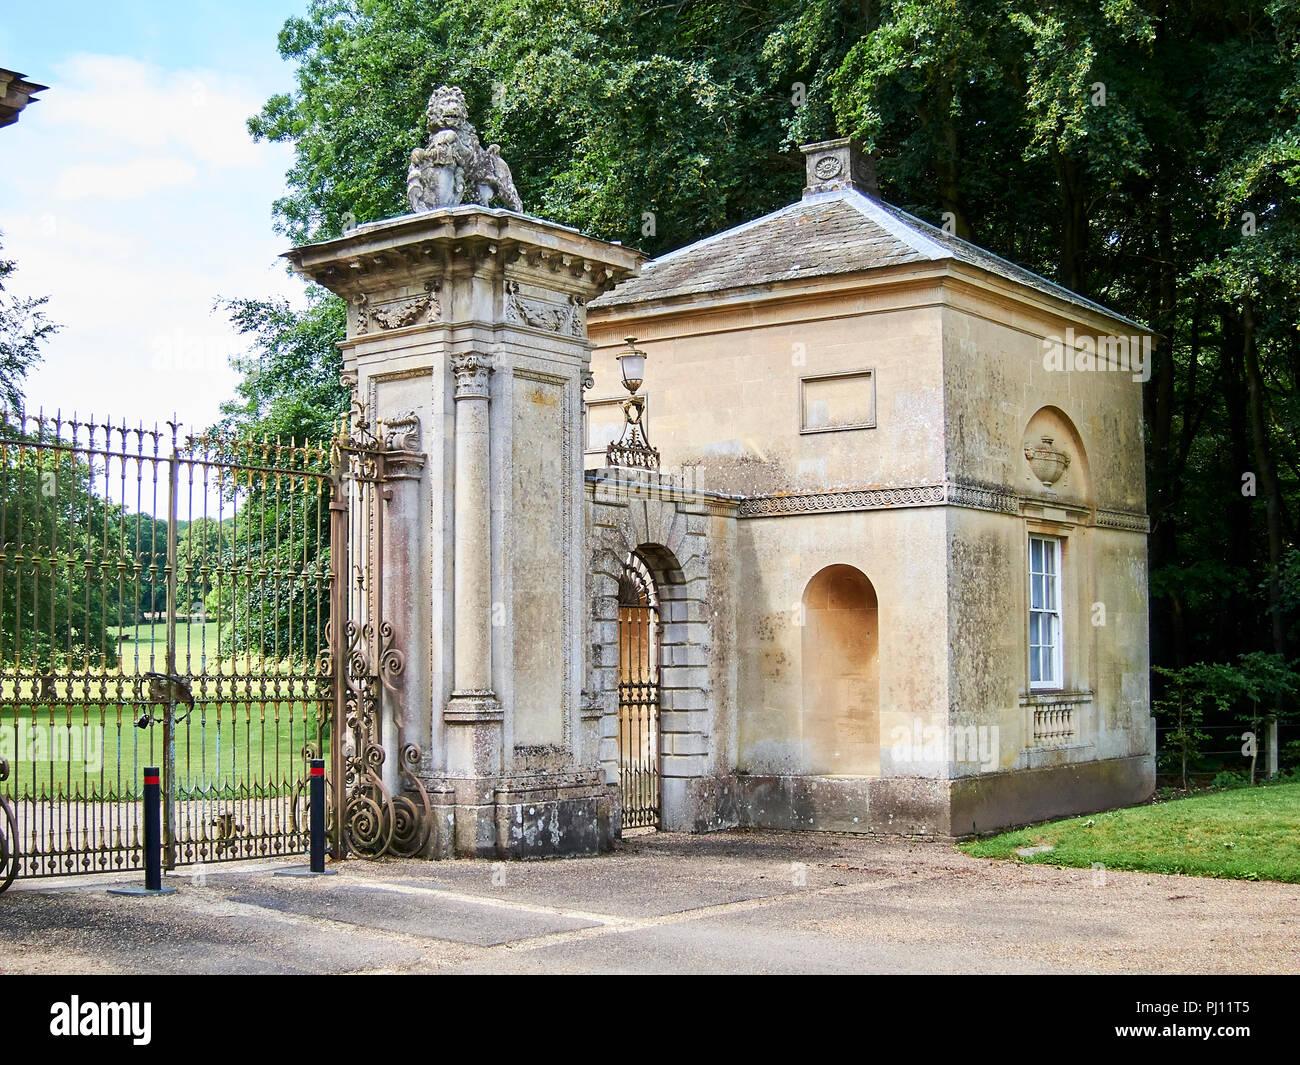 Ramsbury Manor gatehouse - Stock Image